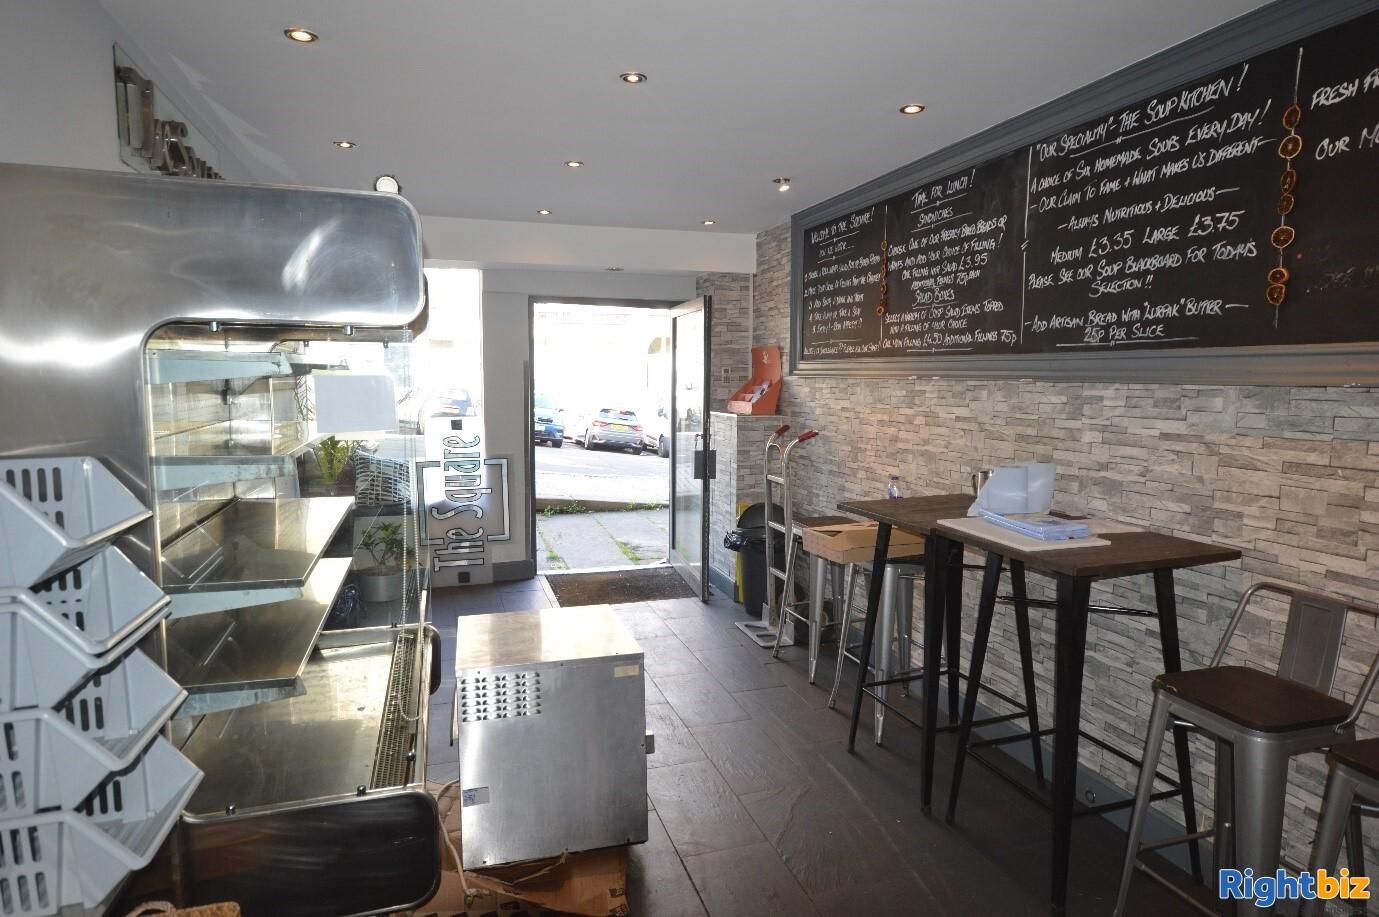 Full Class 3 hot food takeaway in Edinburgh city centre (ref 1396) - Image 5